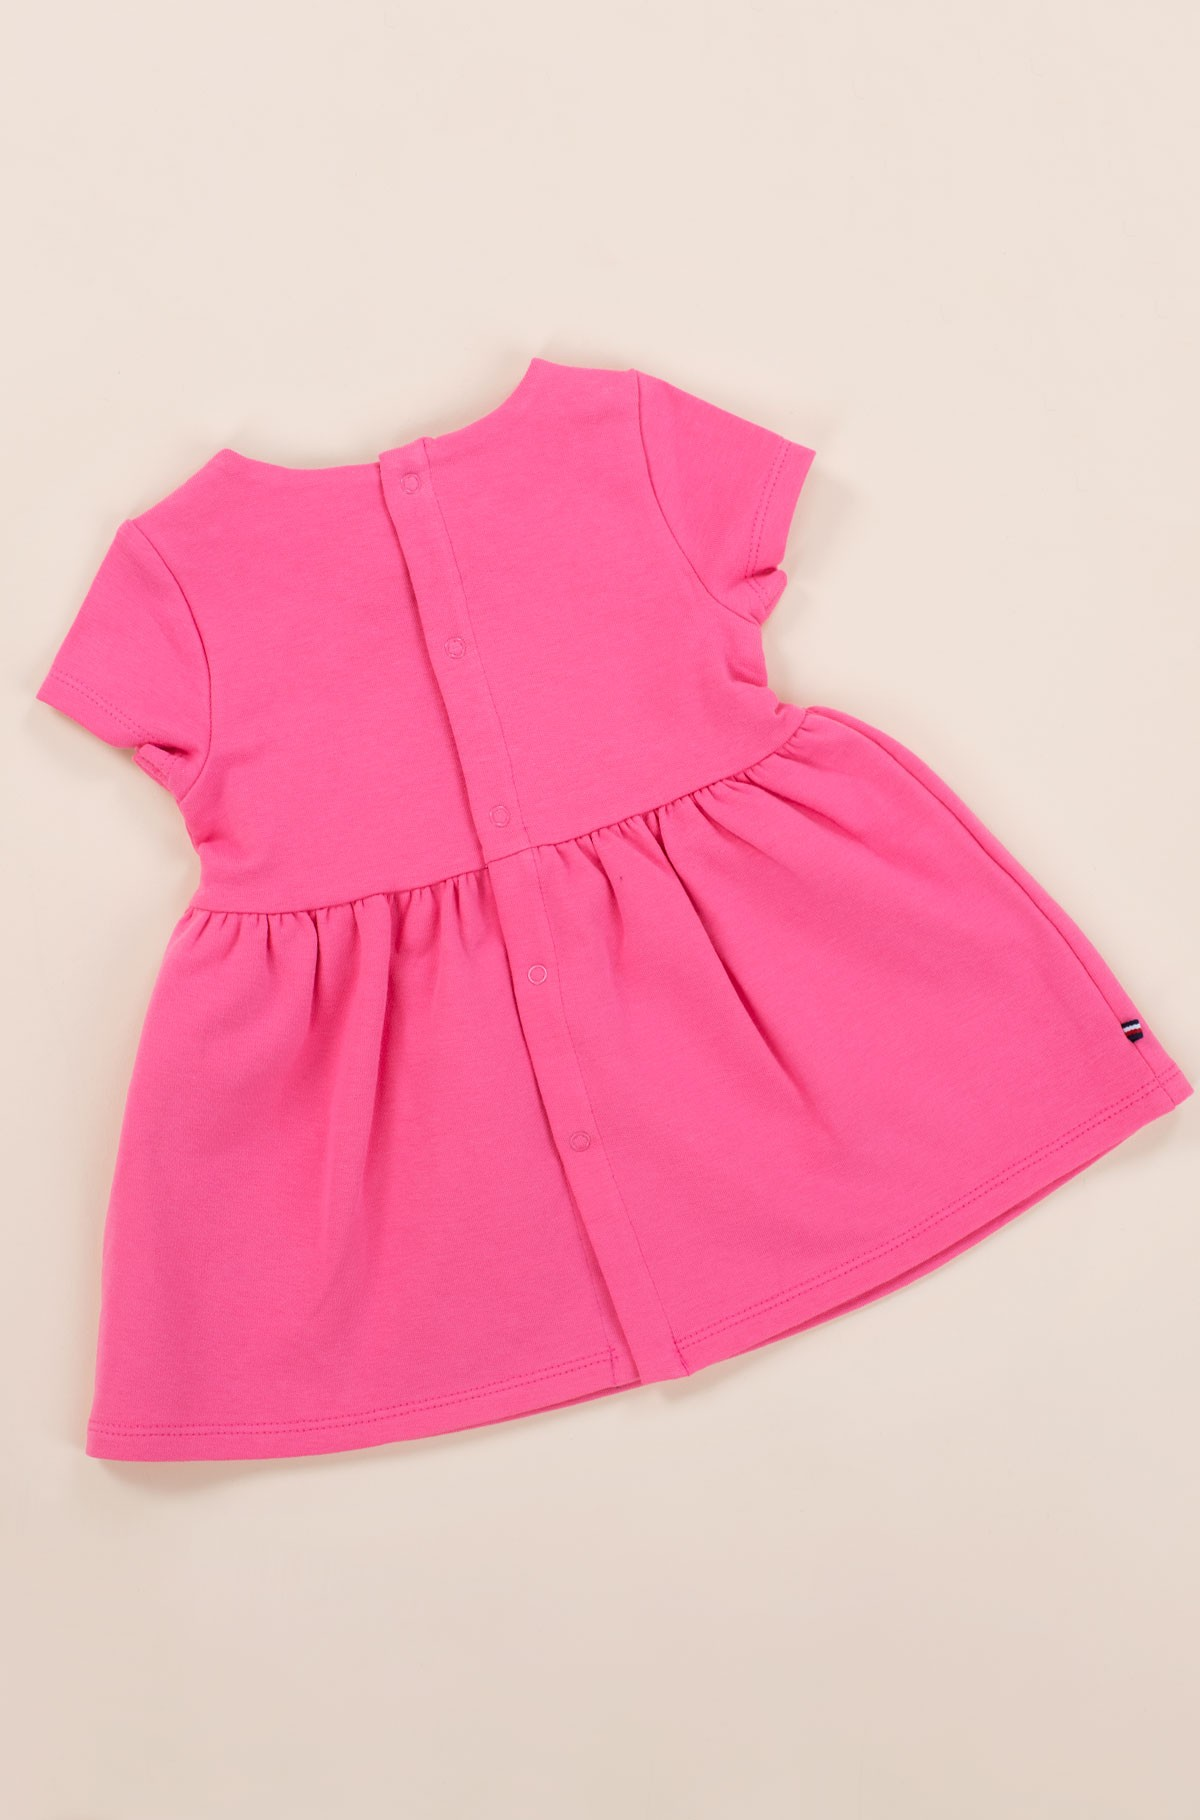 Bērnu kleita BABY ESSENTIAL DRESS S/S-full-3